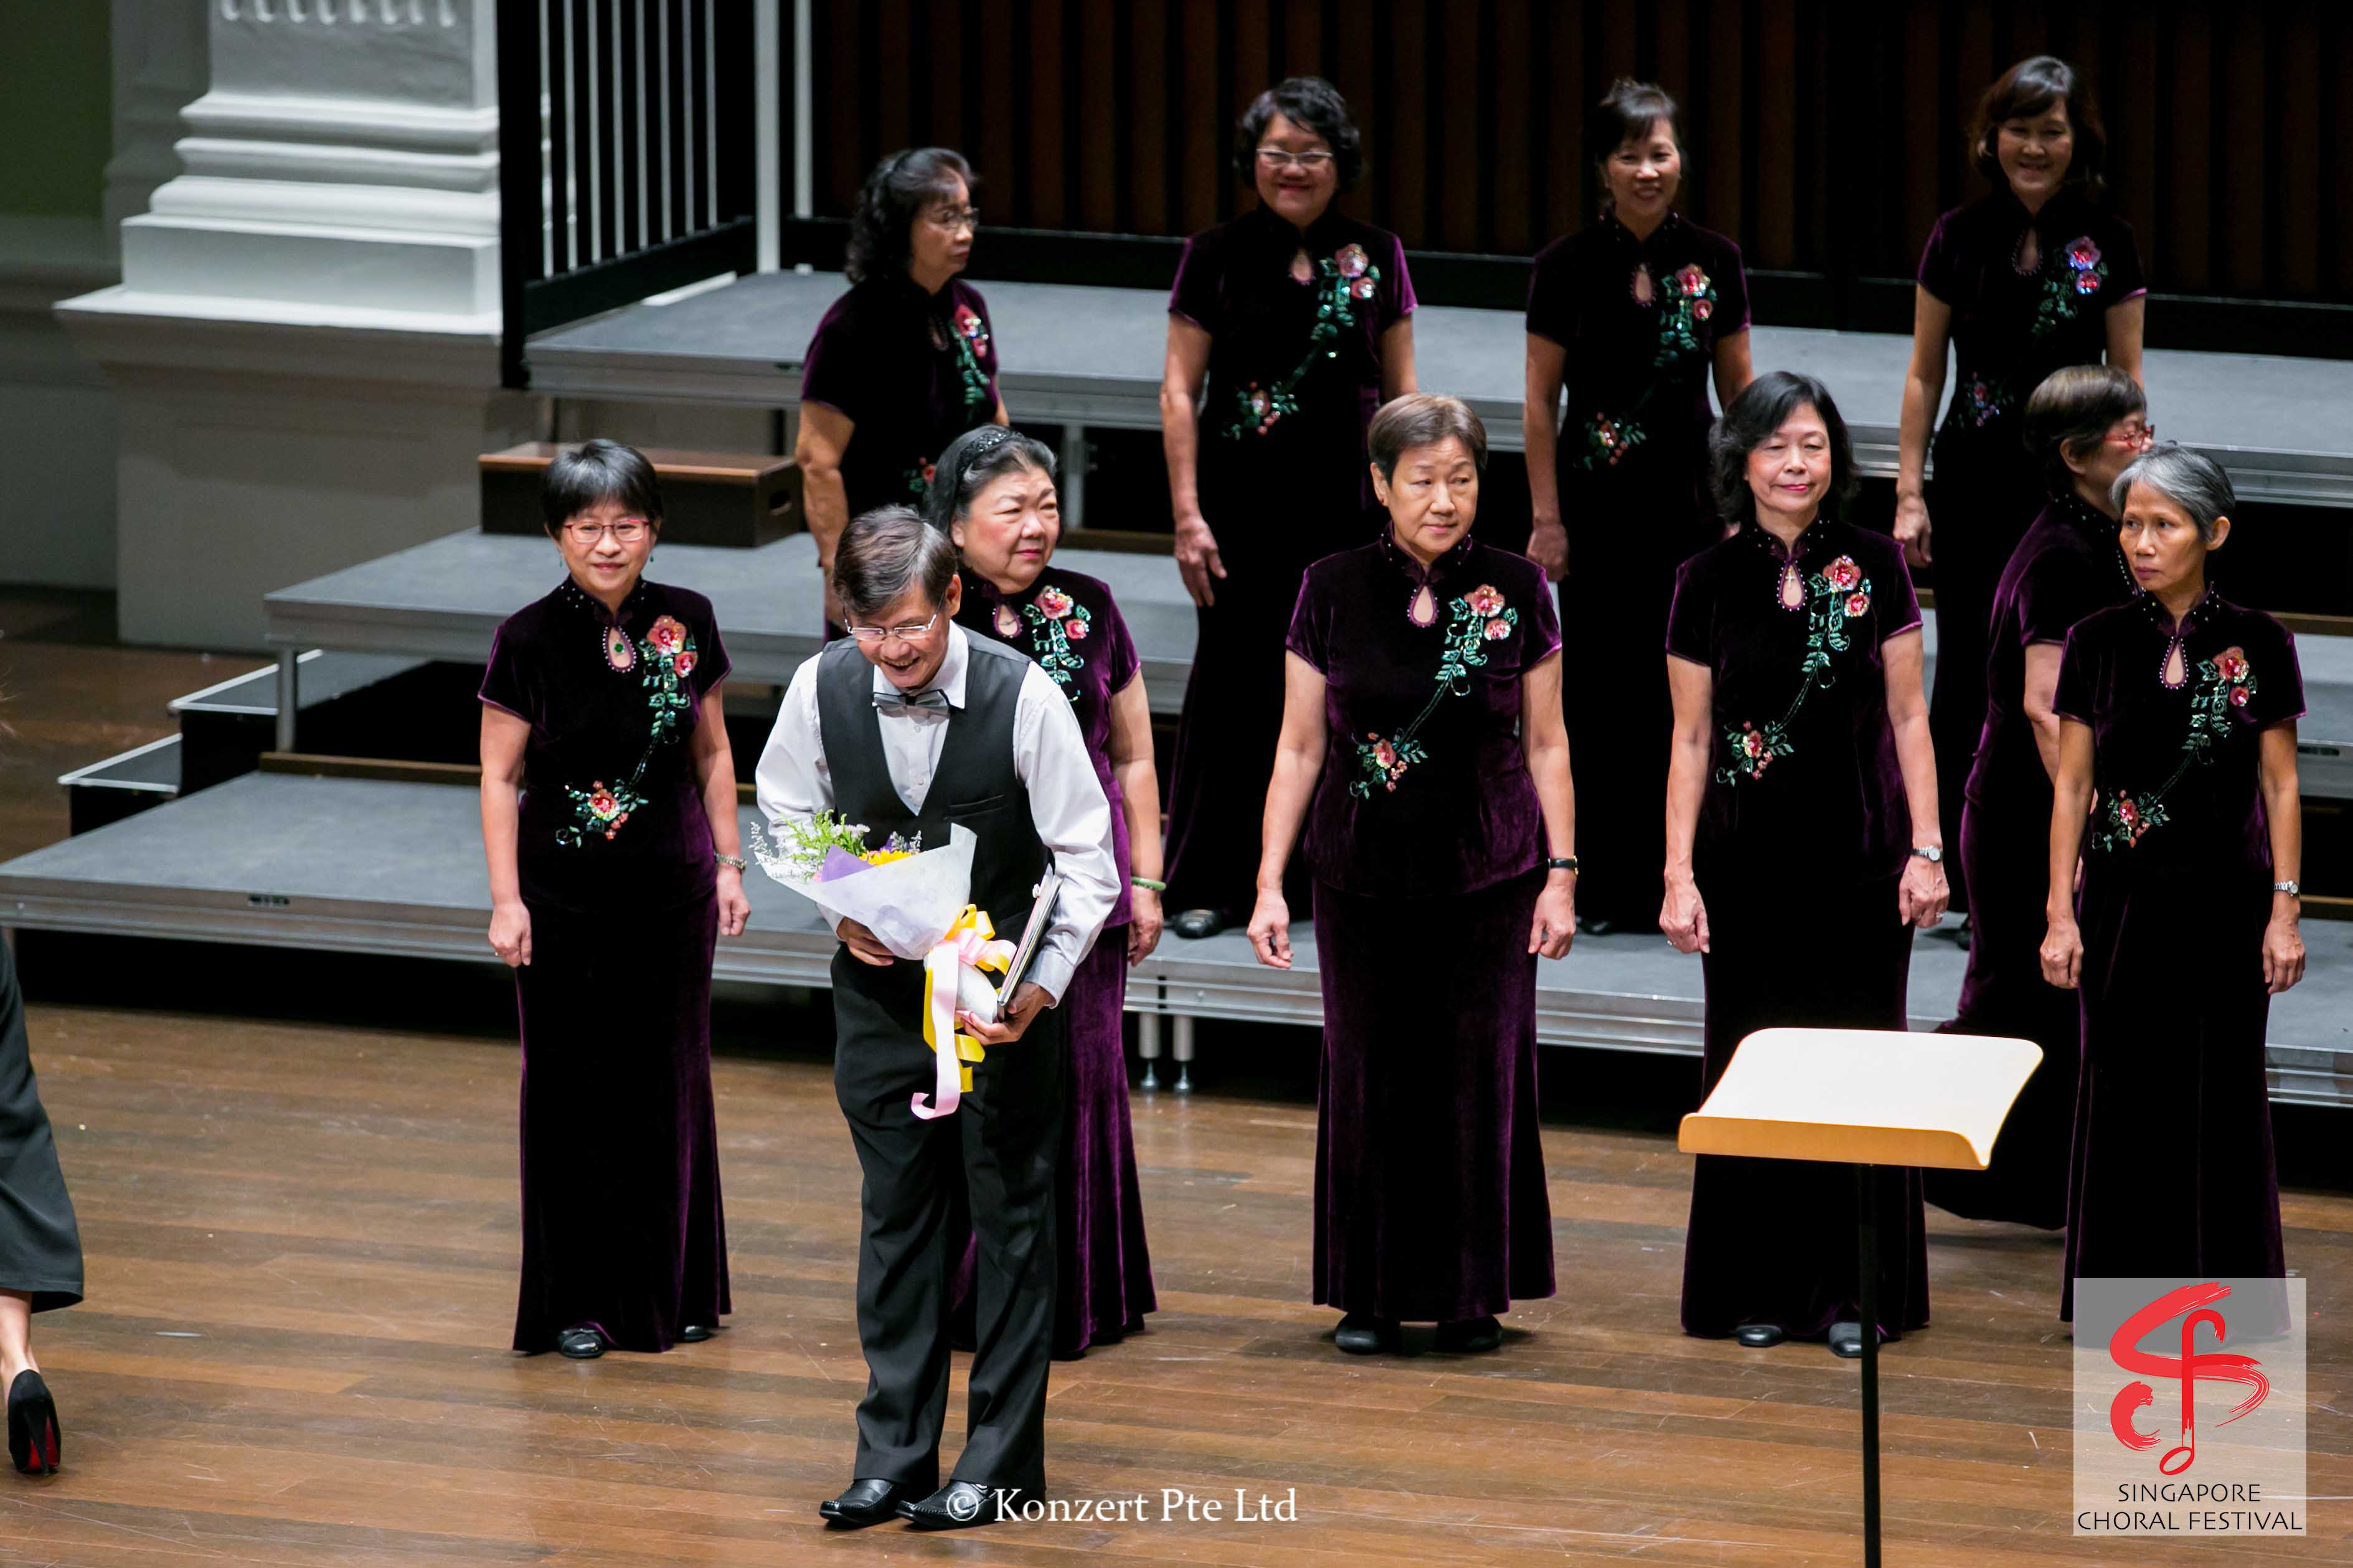 Singapore Choral Festival 8-8-15 (211).jpg